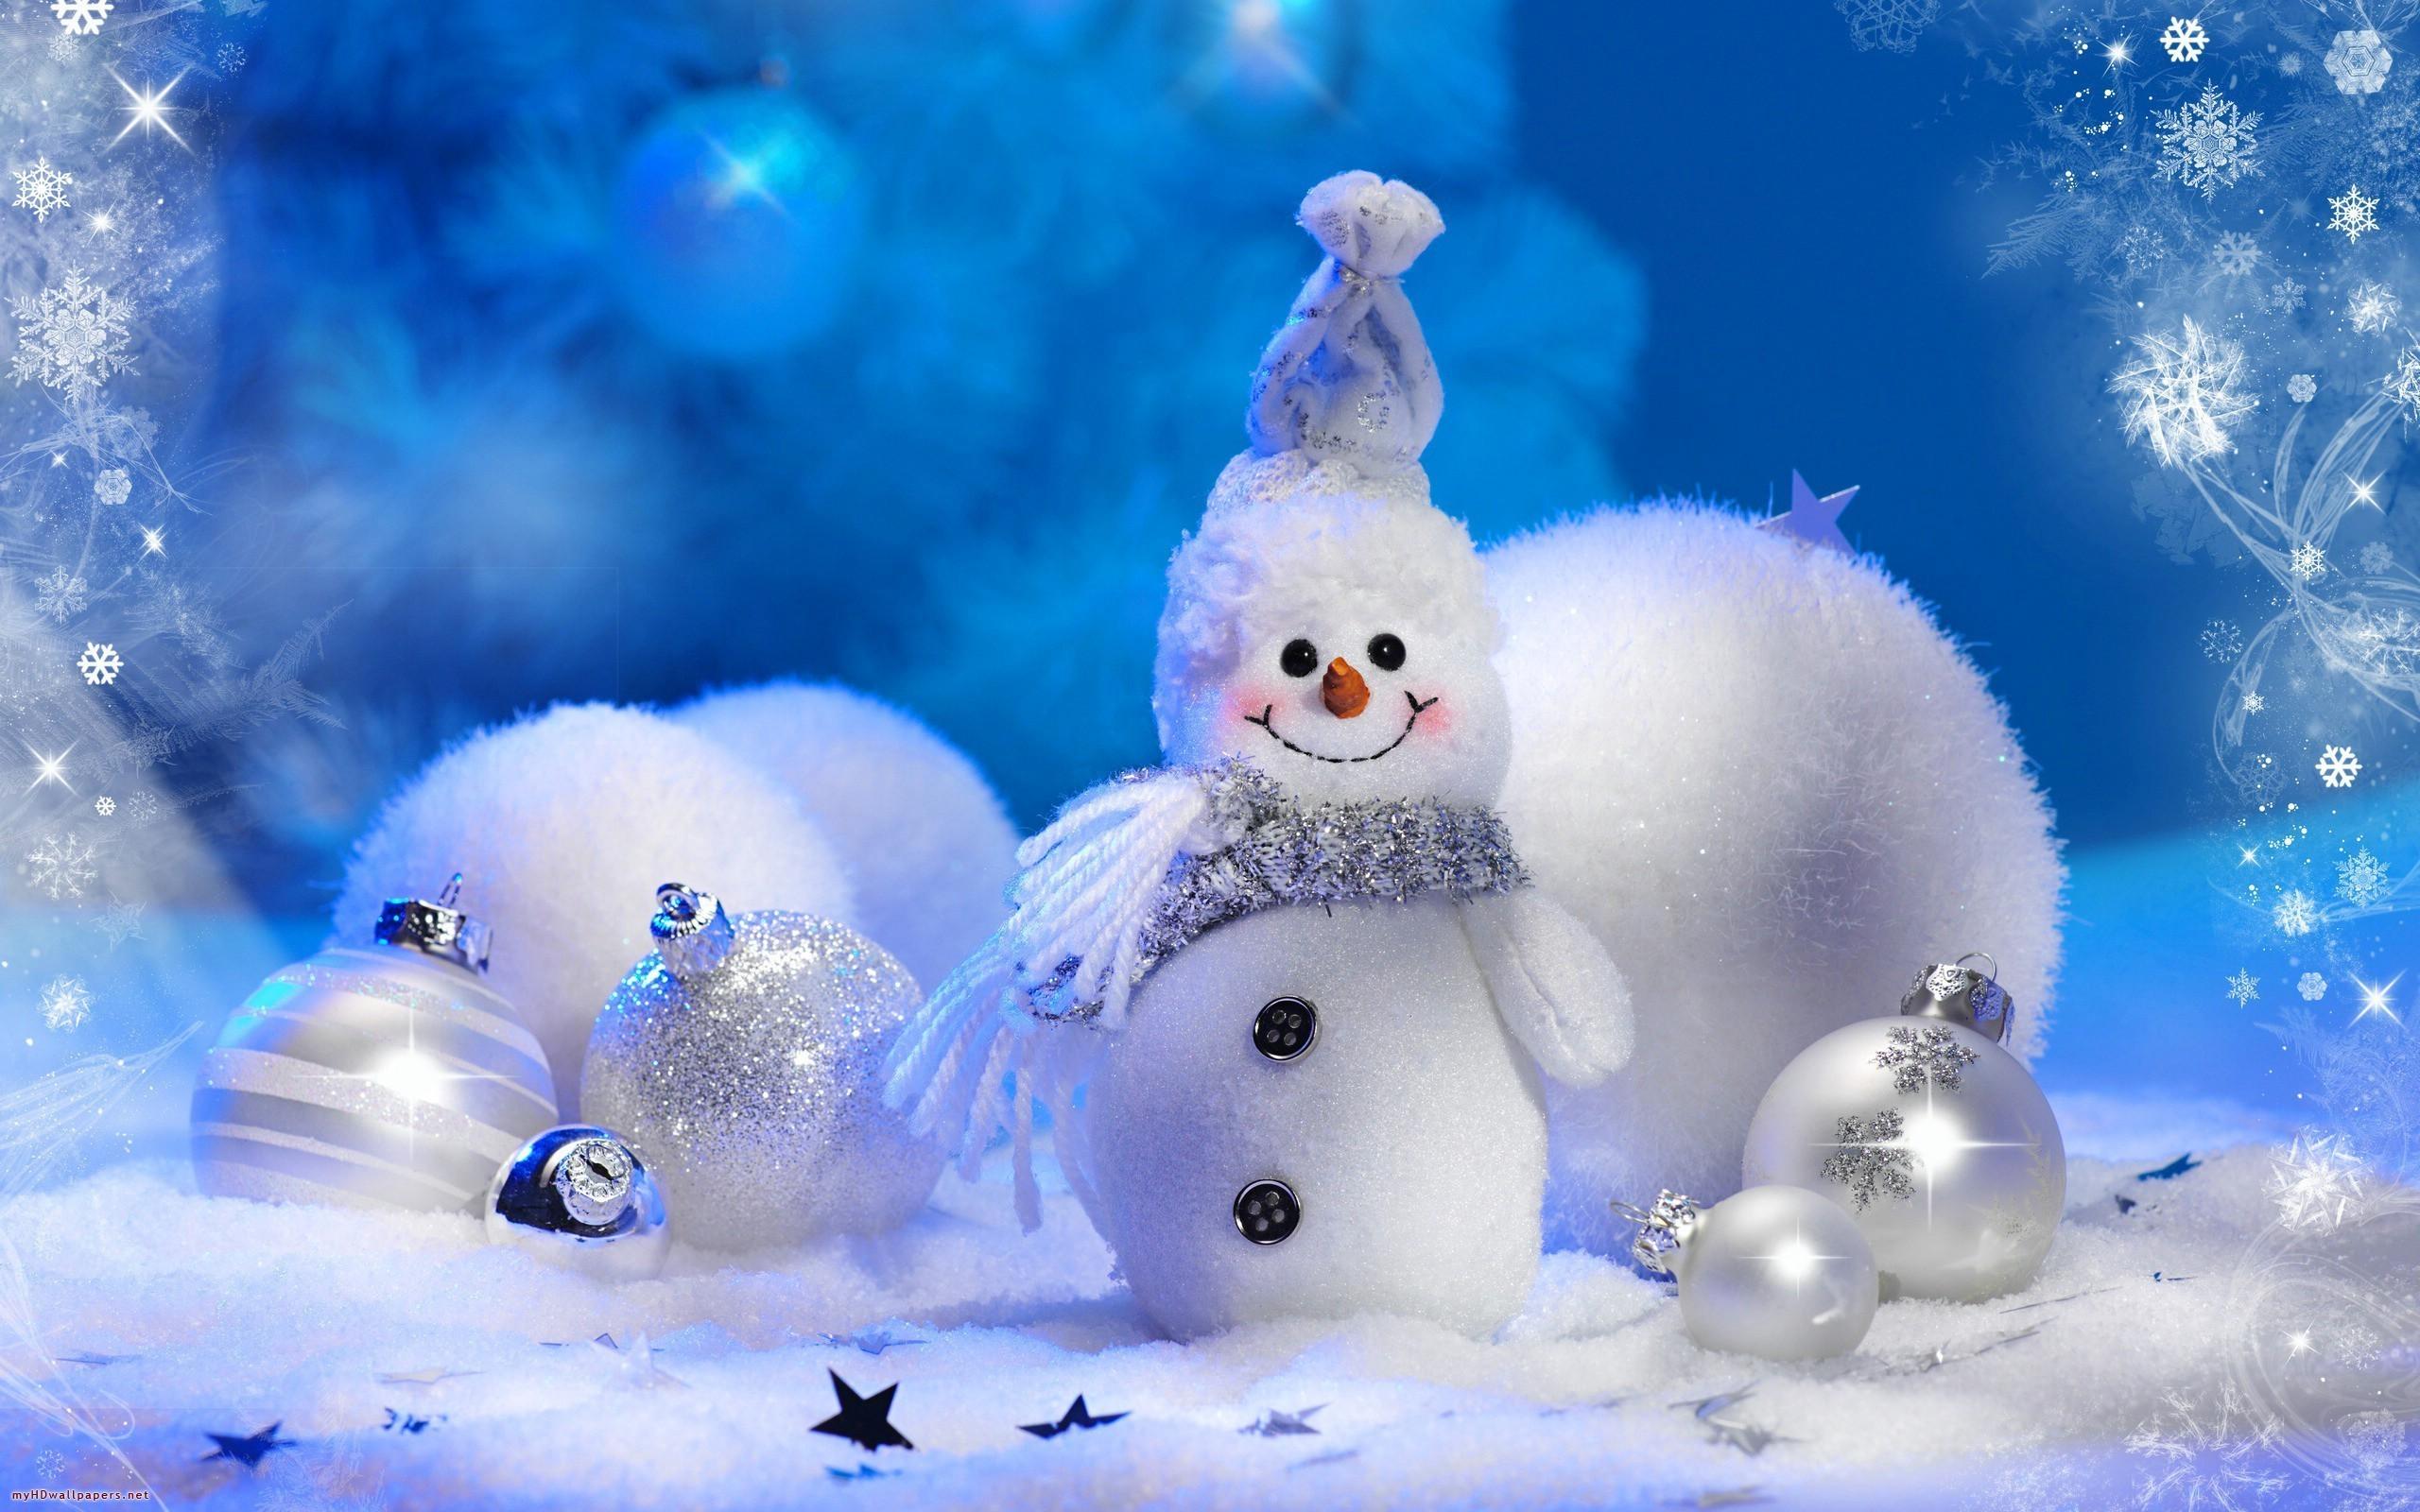 Christmas Desktop Backgrounds 60 images 2560x1600